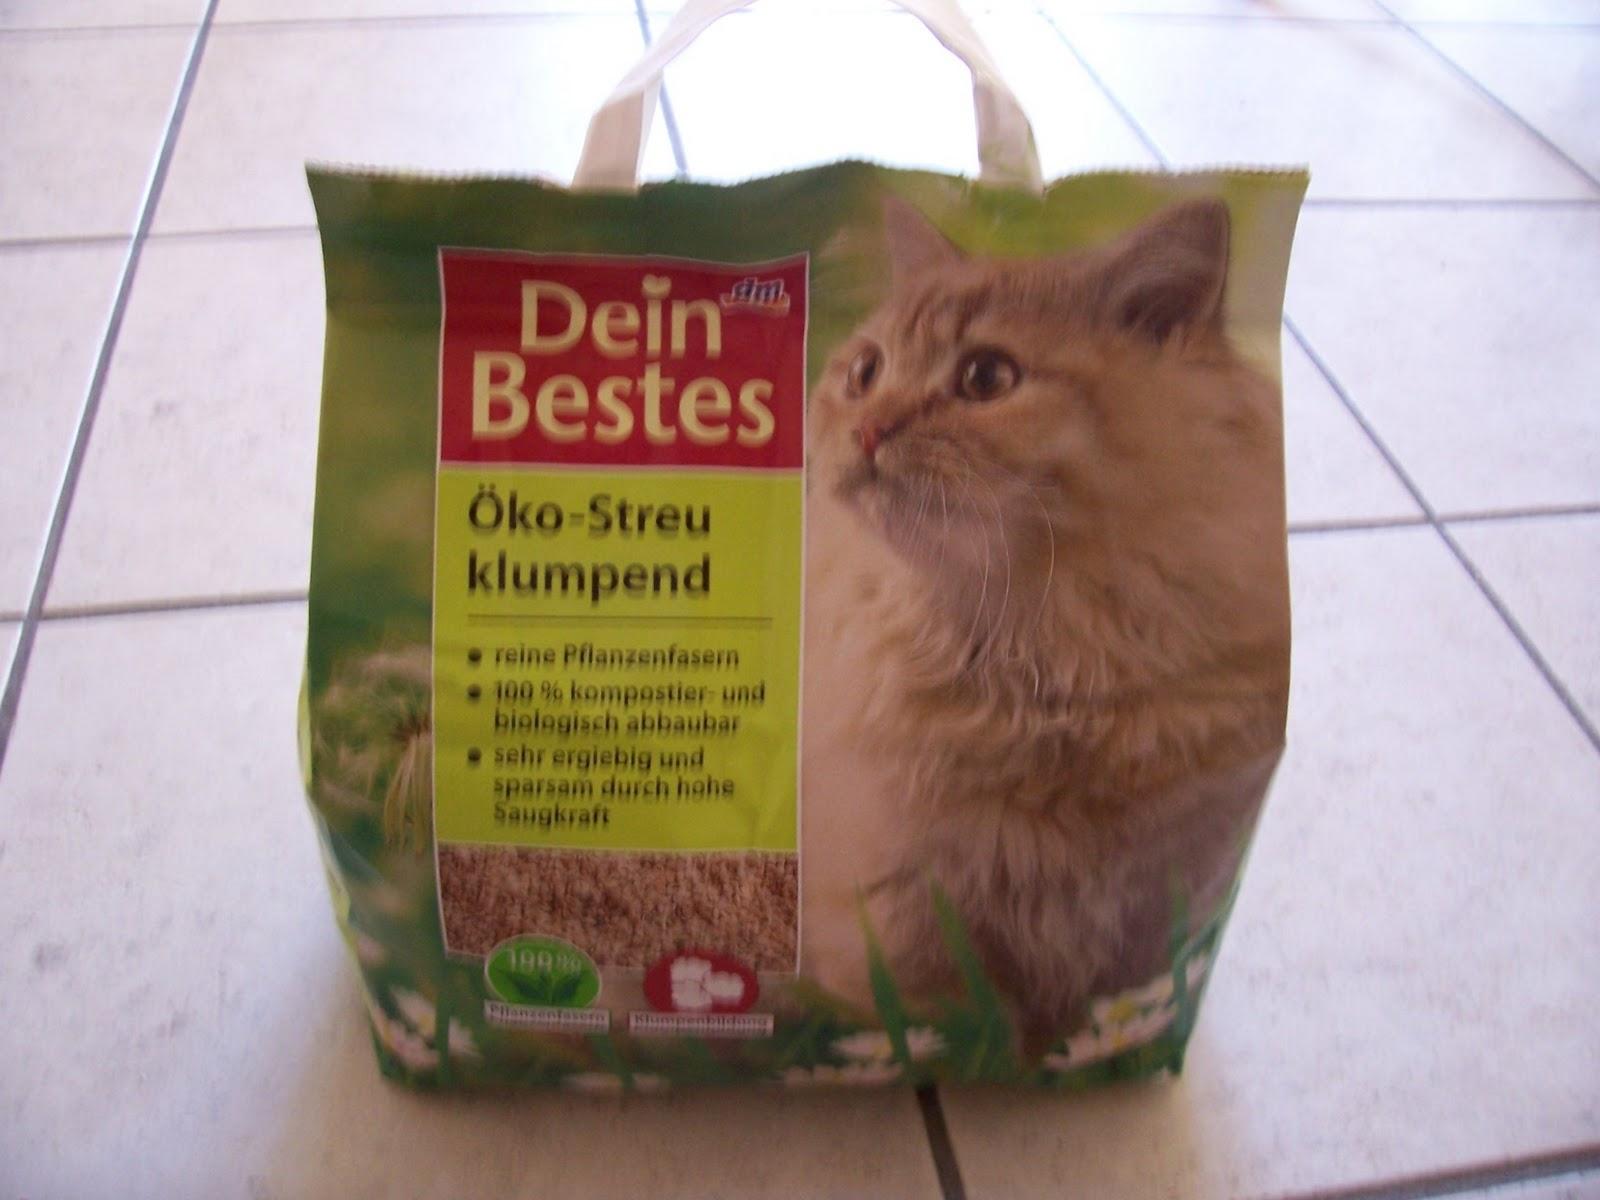 Katzenwissen Erfahrungsbericht Dein Bestes öko Klumpstreu